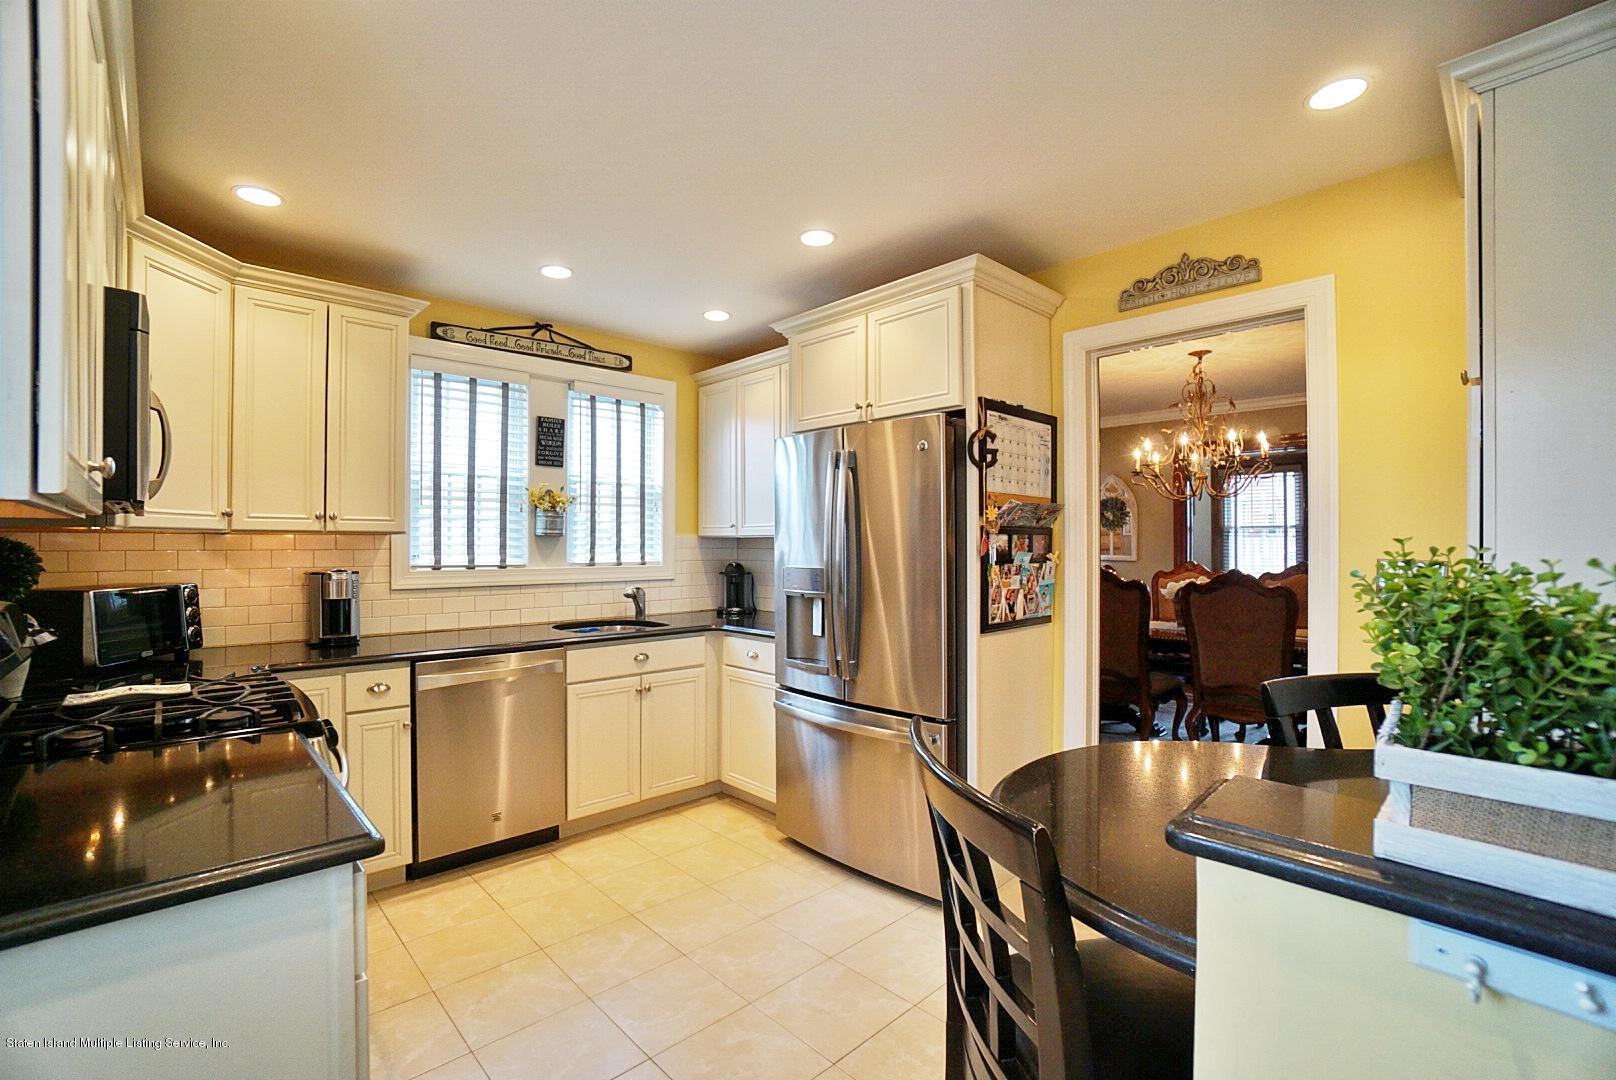 Single Family - Detached 171 Keiber Court  Staten Island, NY 10314, MLS-1127425-14